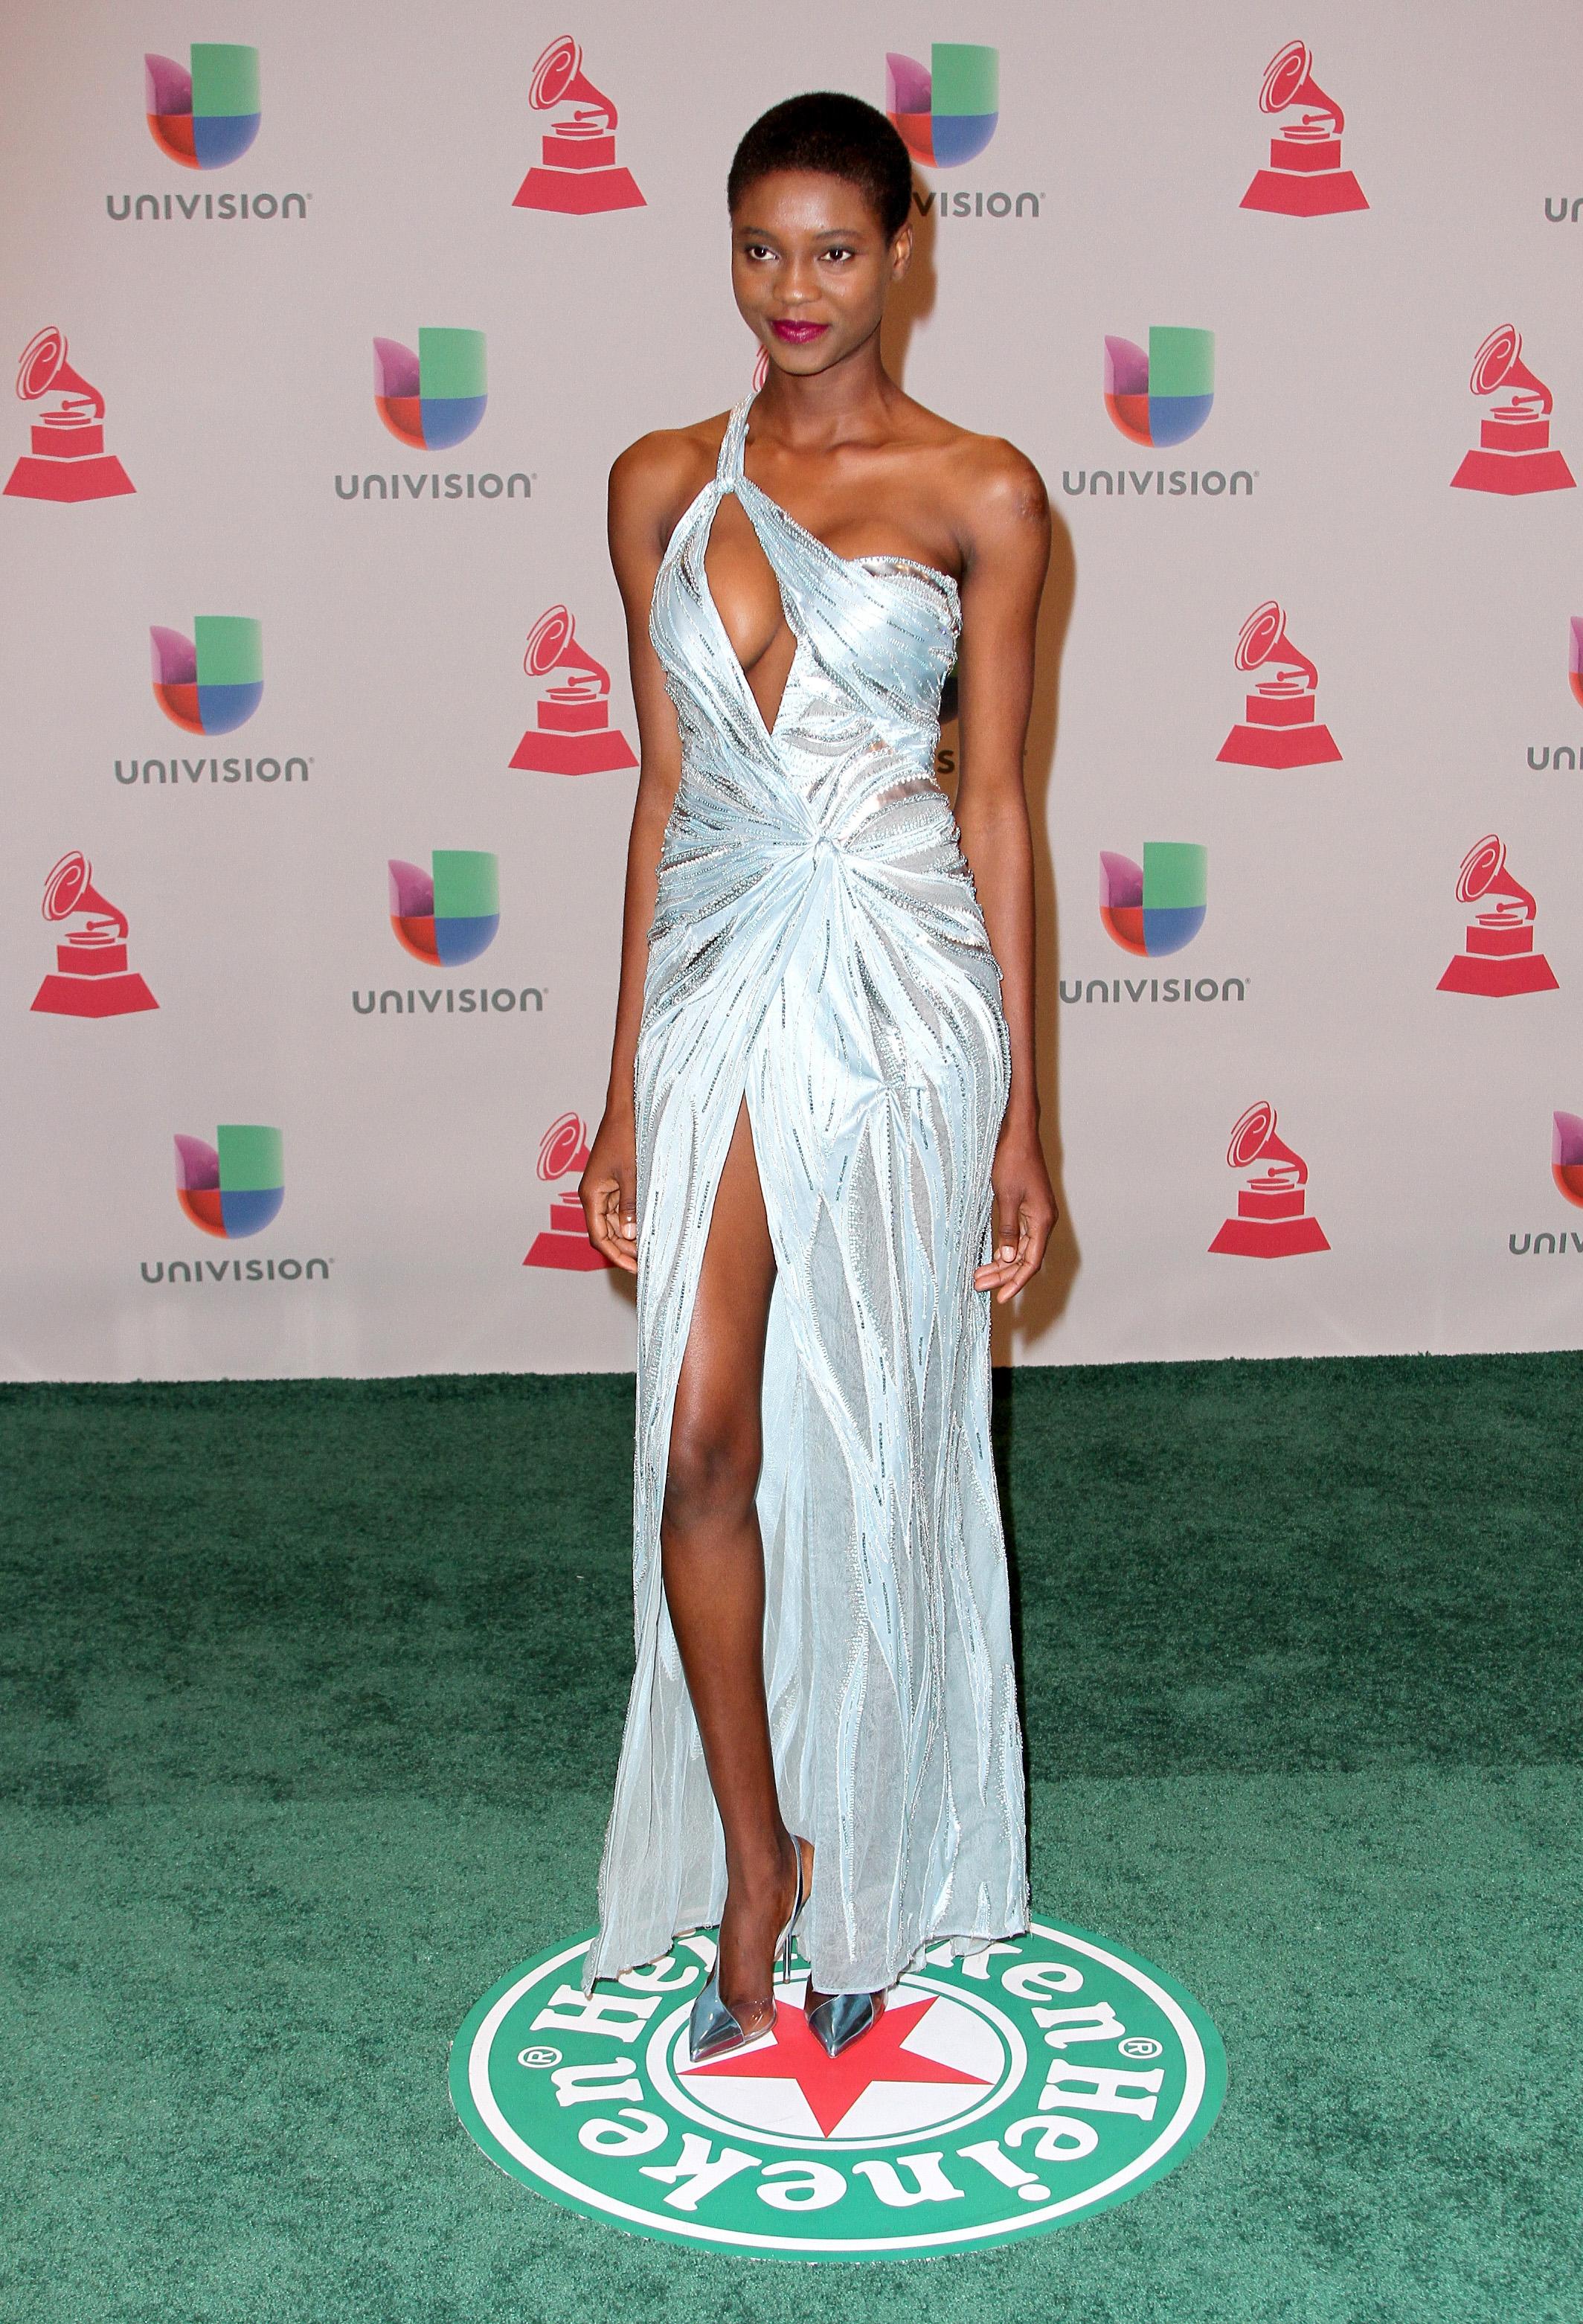 Mauza Antonio, Latin Grammy 2014 ellas en la alfombra